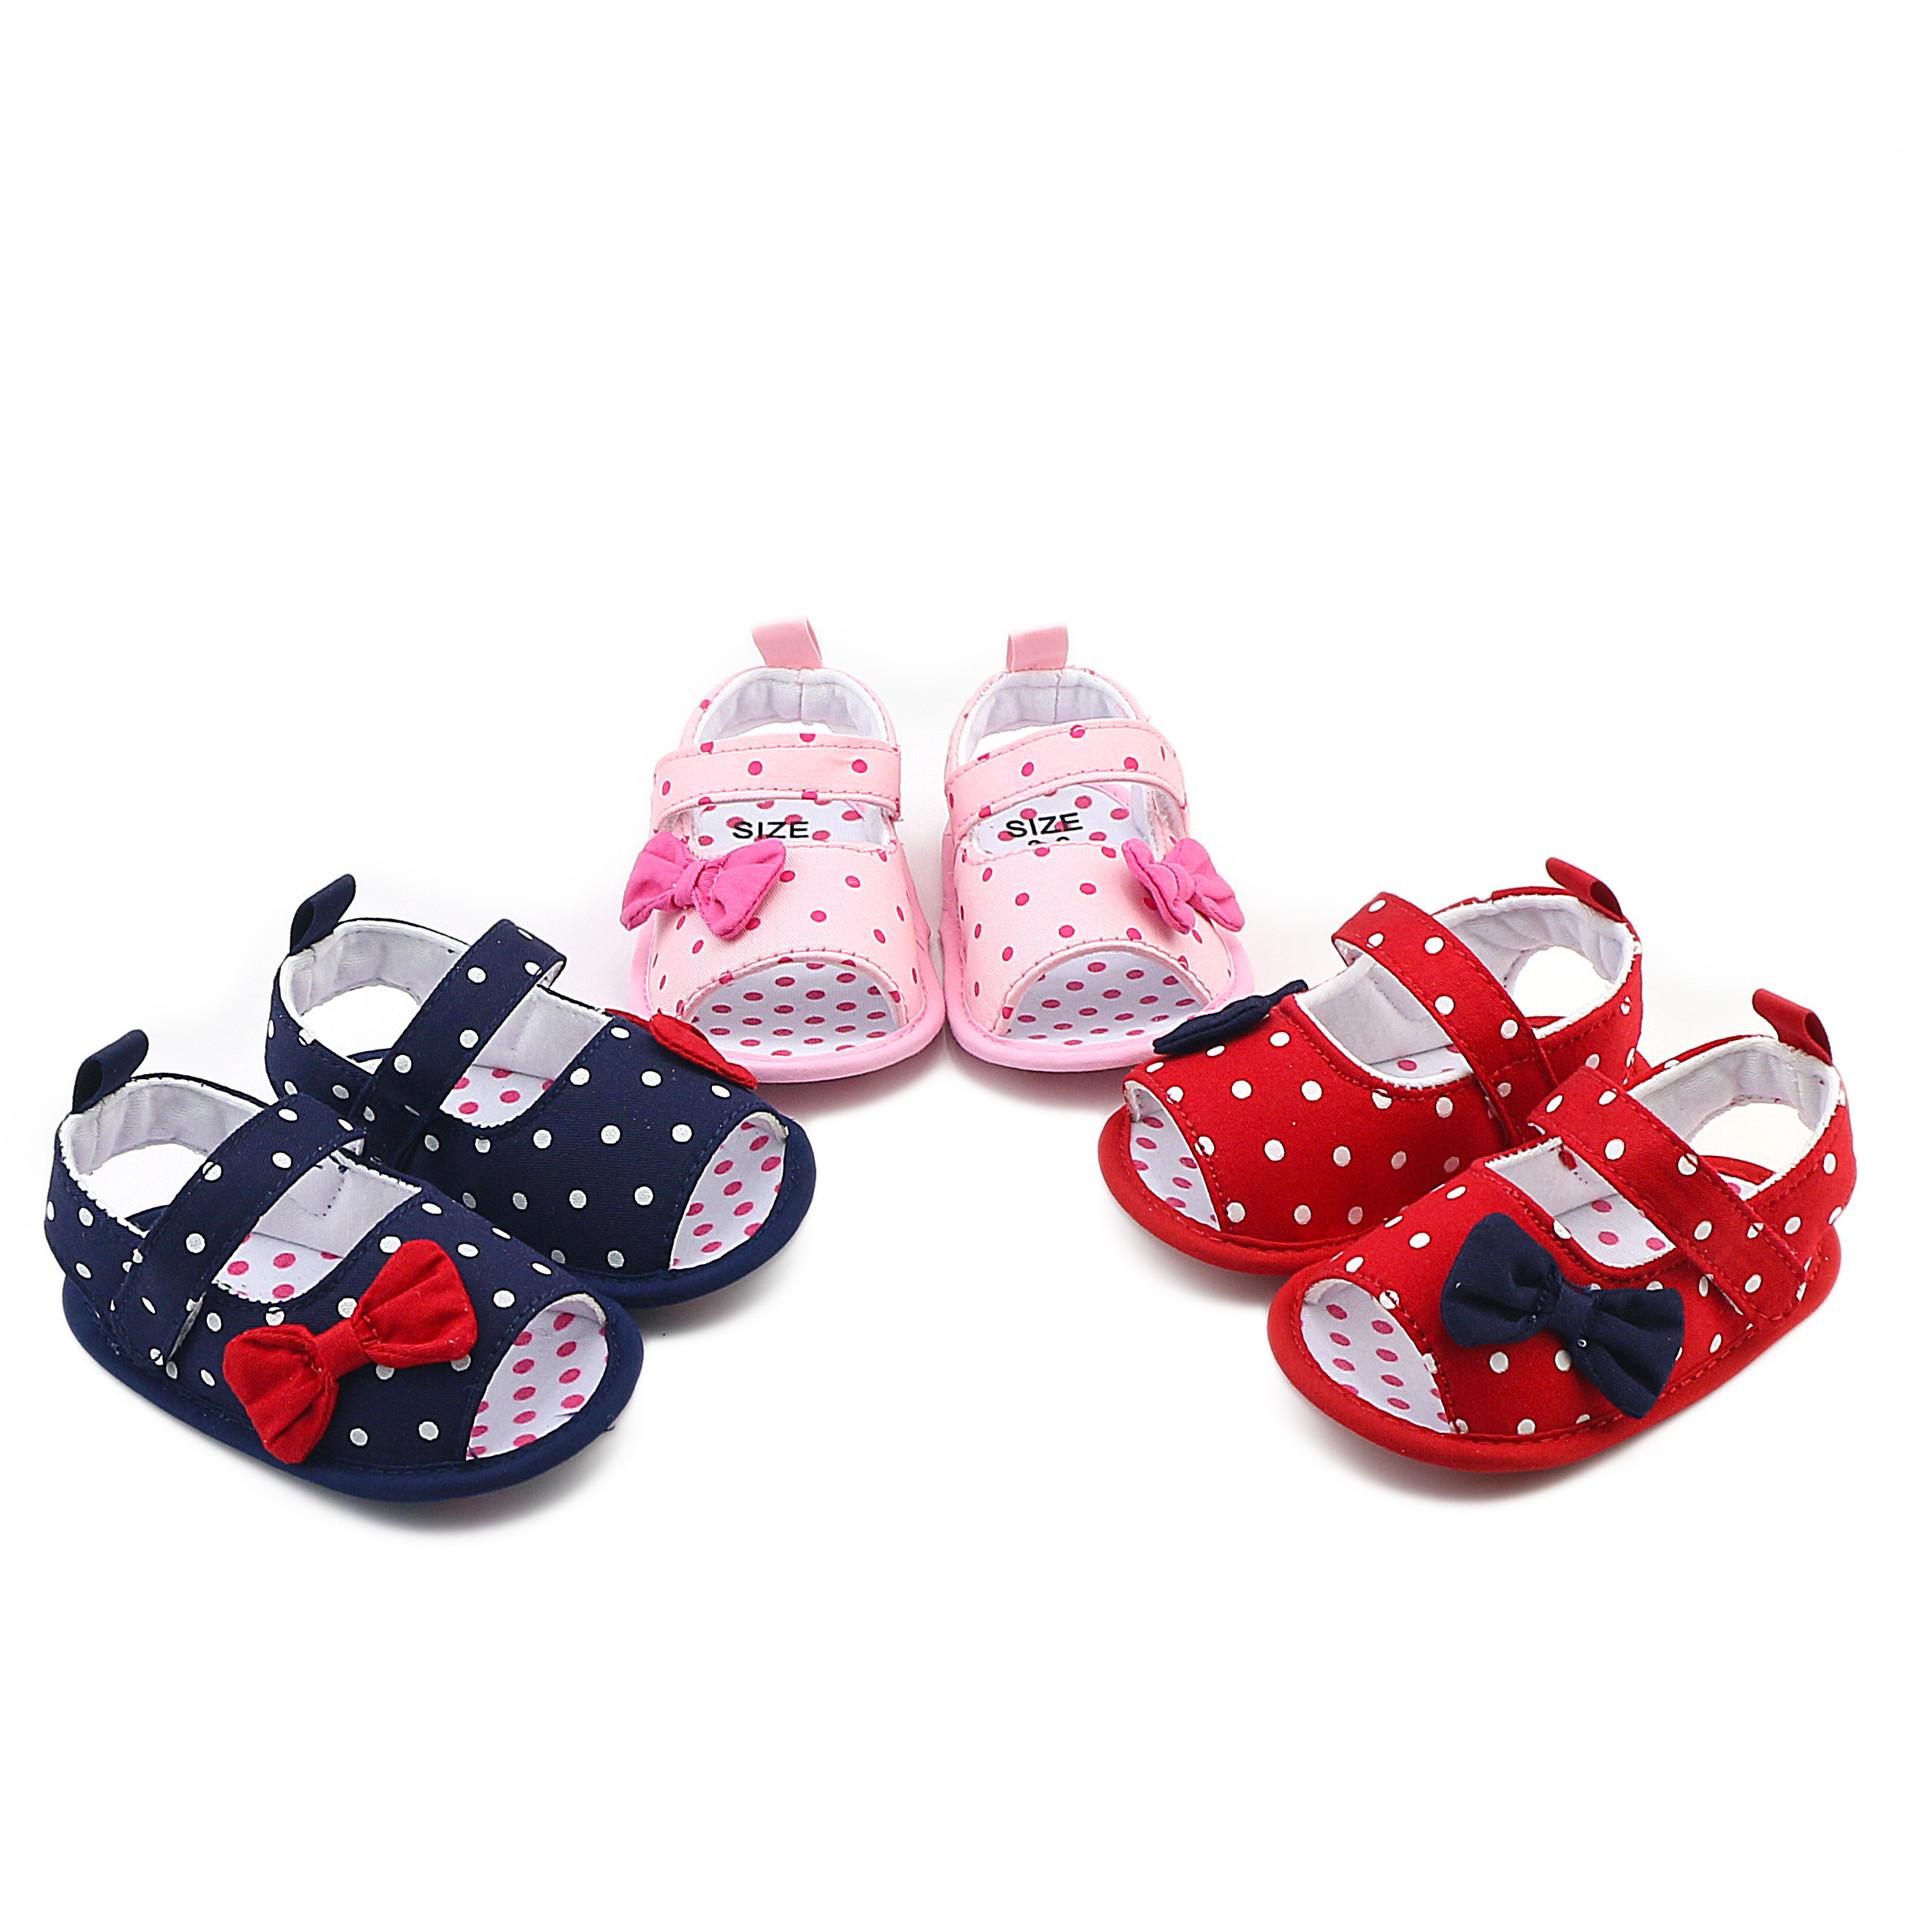 Pre-walker Baby Shoes รองเท้าเด็ก รองเท้าเด็กวัยหัดเดิน รองเท้าแตะเด็กหญิง พร้อมส่ง